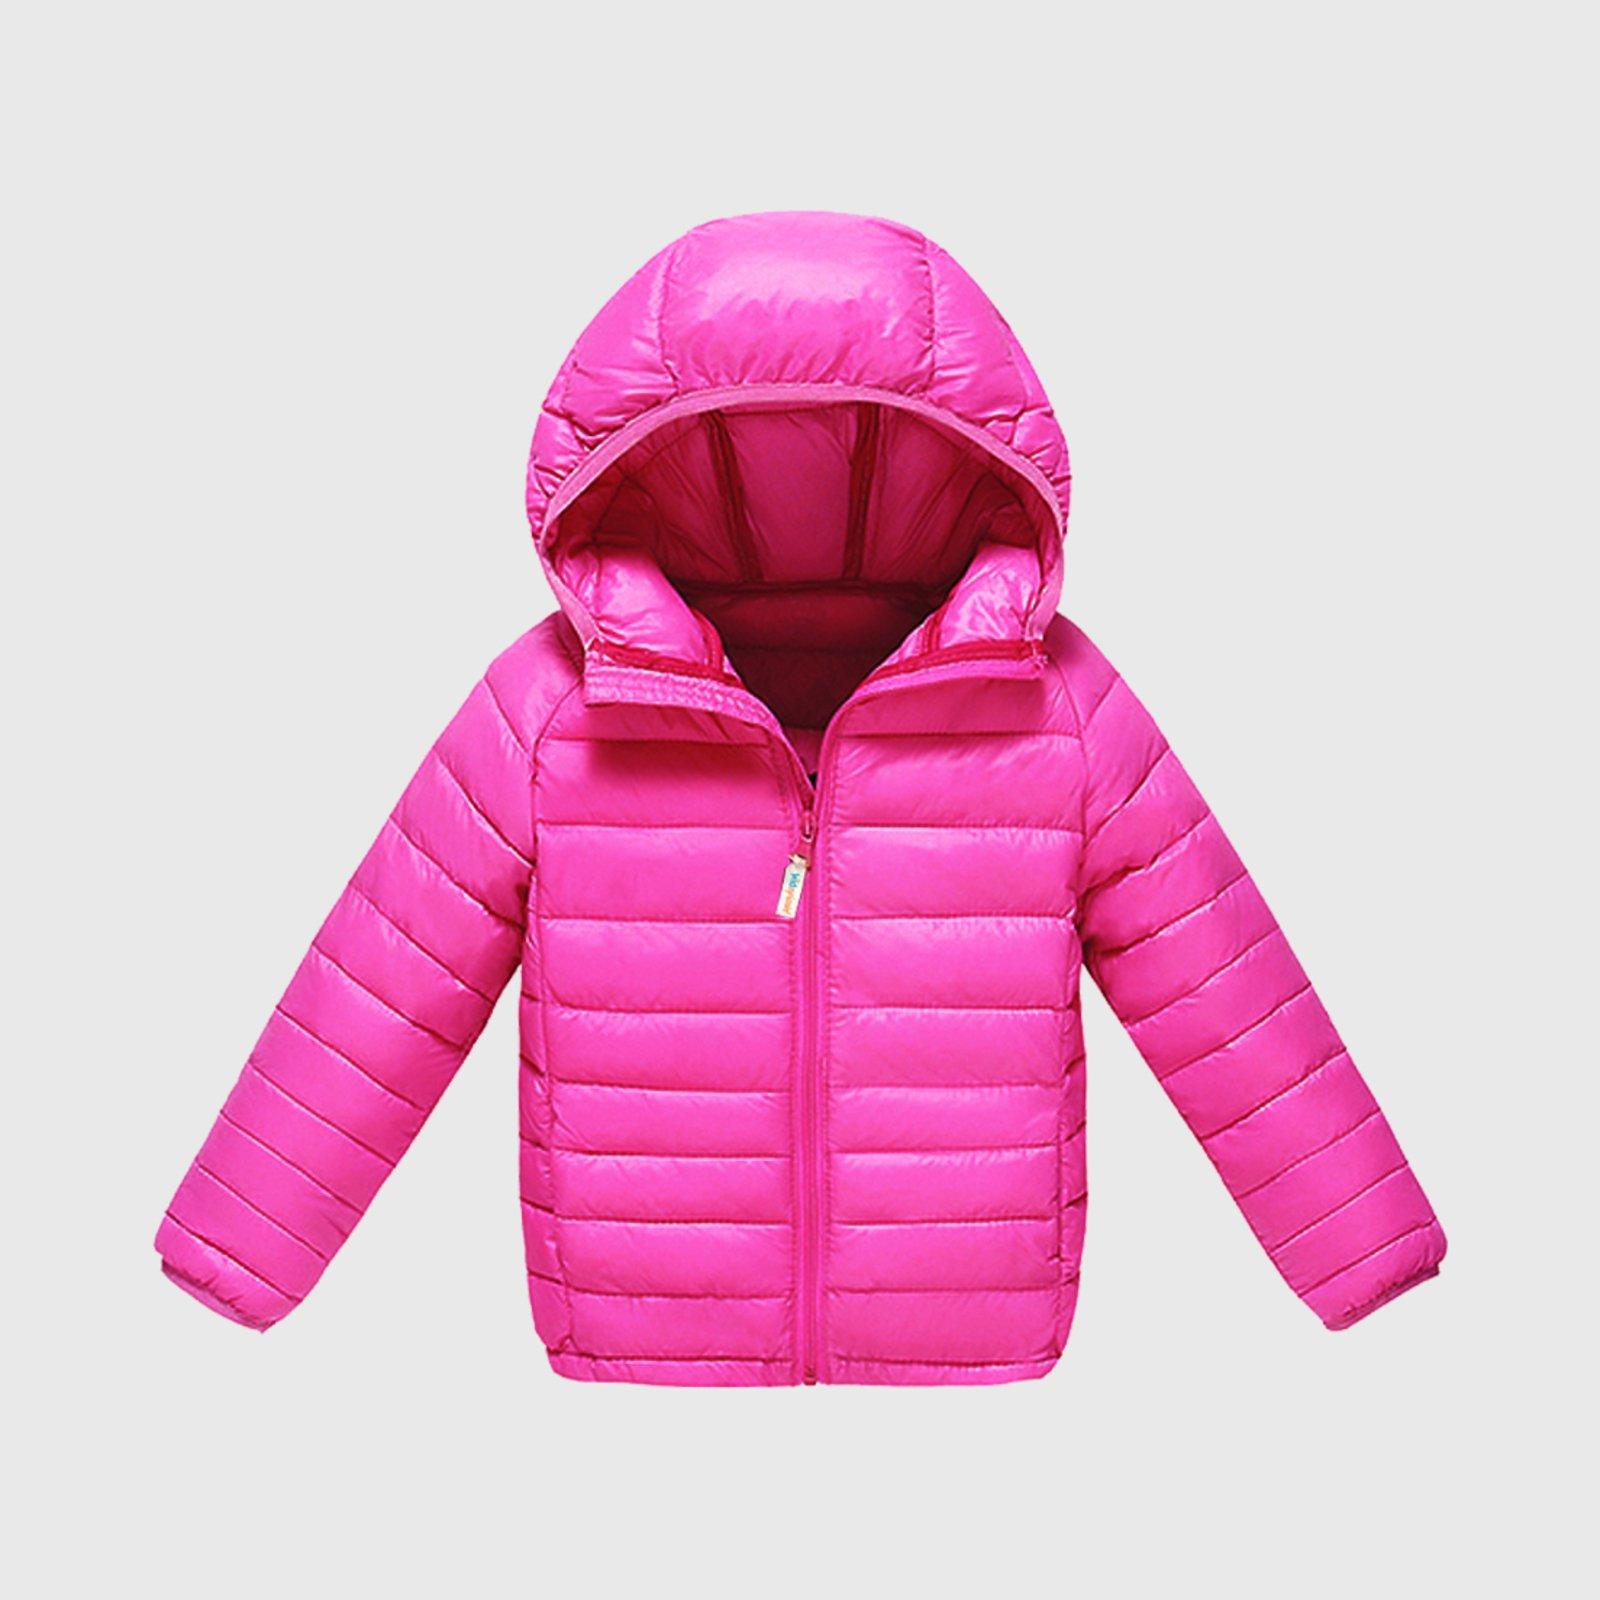 4ac6104ba7bbe Jaqueta Ultraleve Infantil KidSplash! Pink - Compre Agora